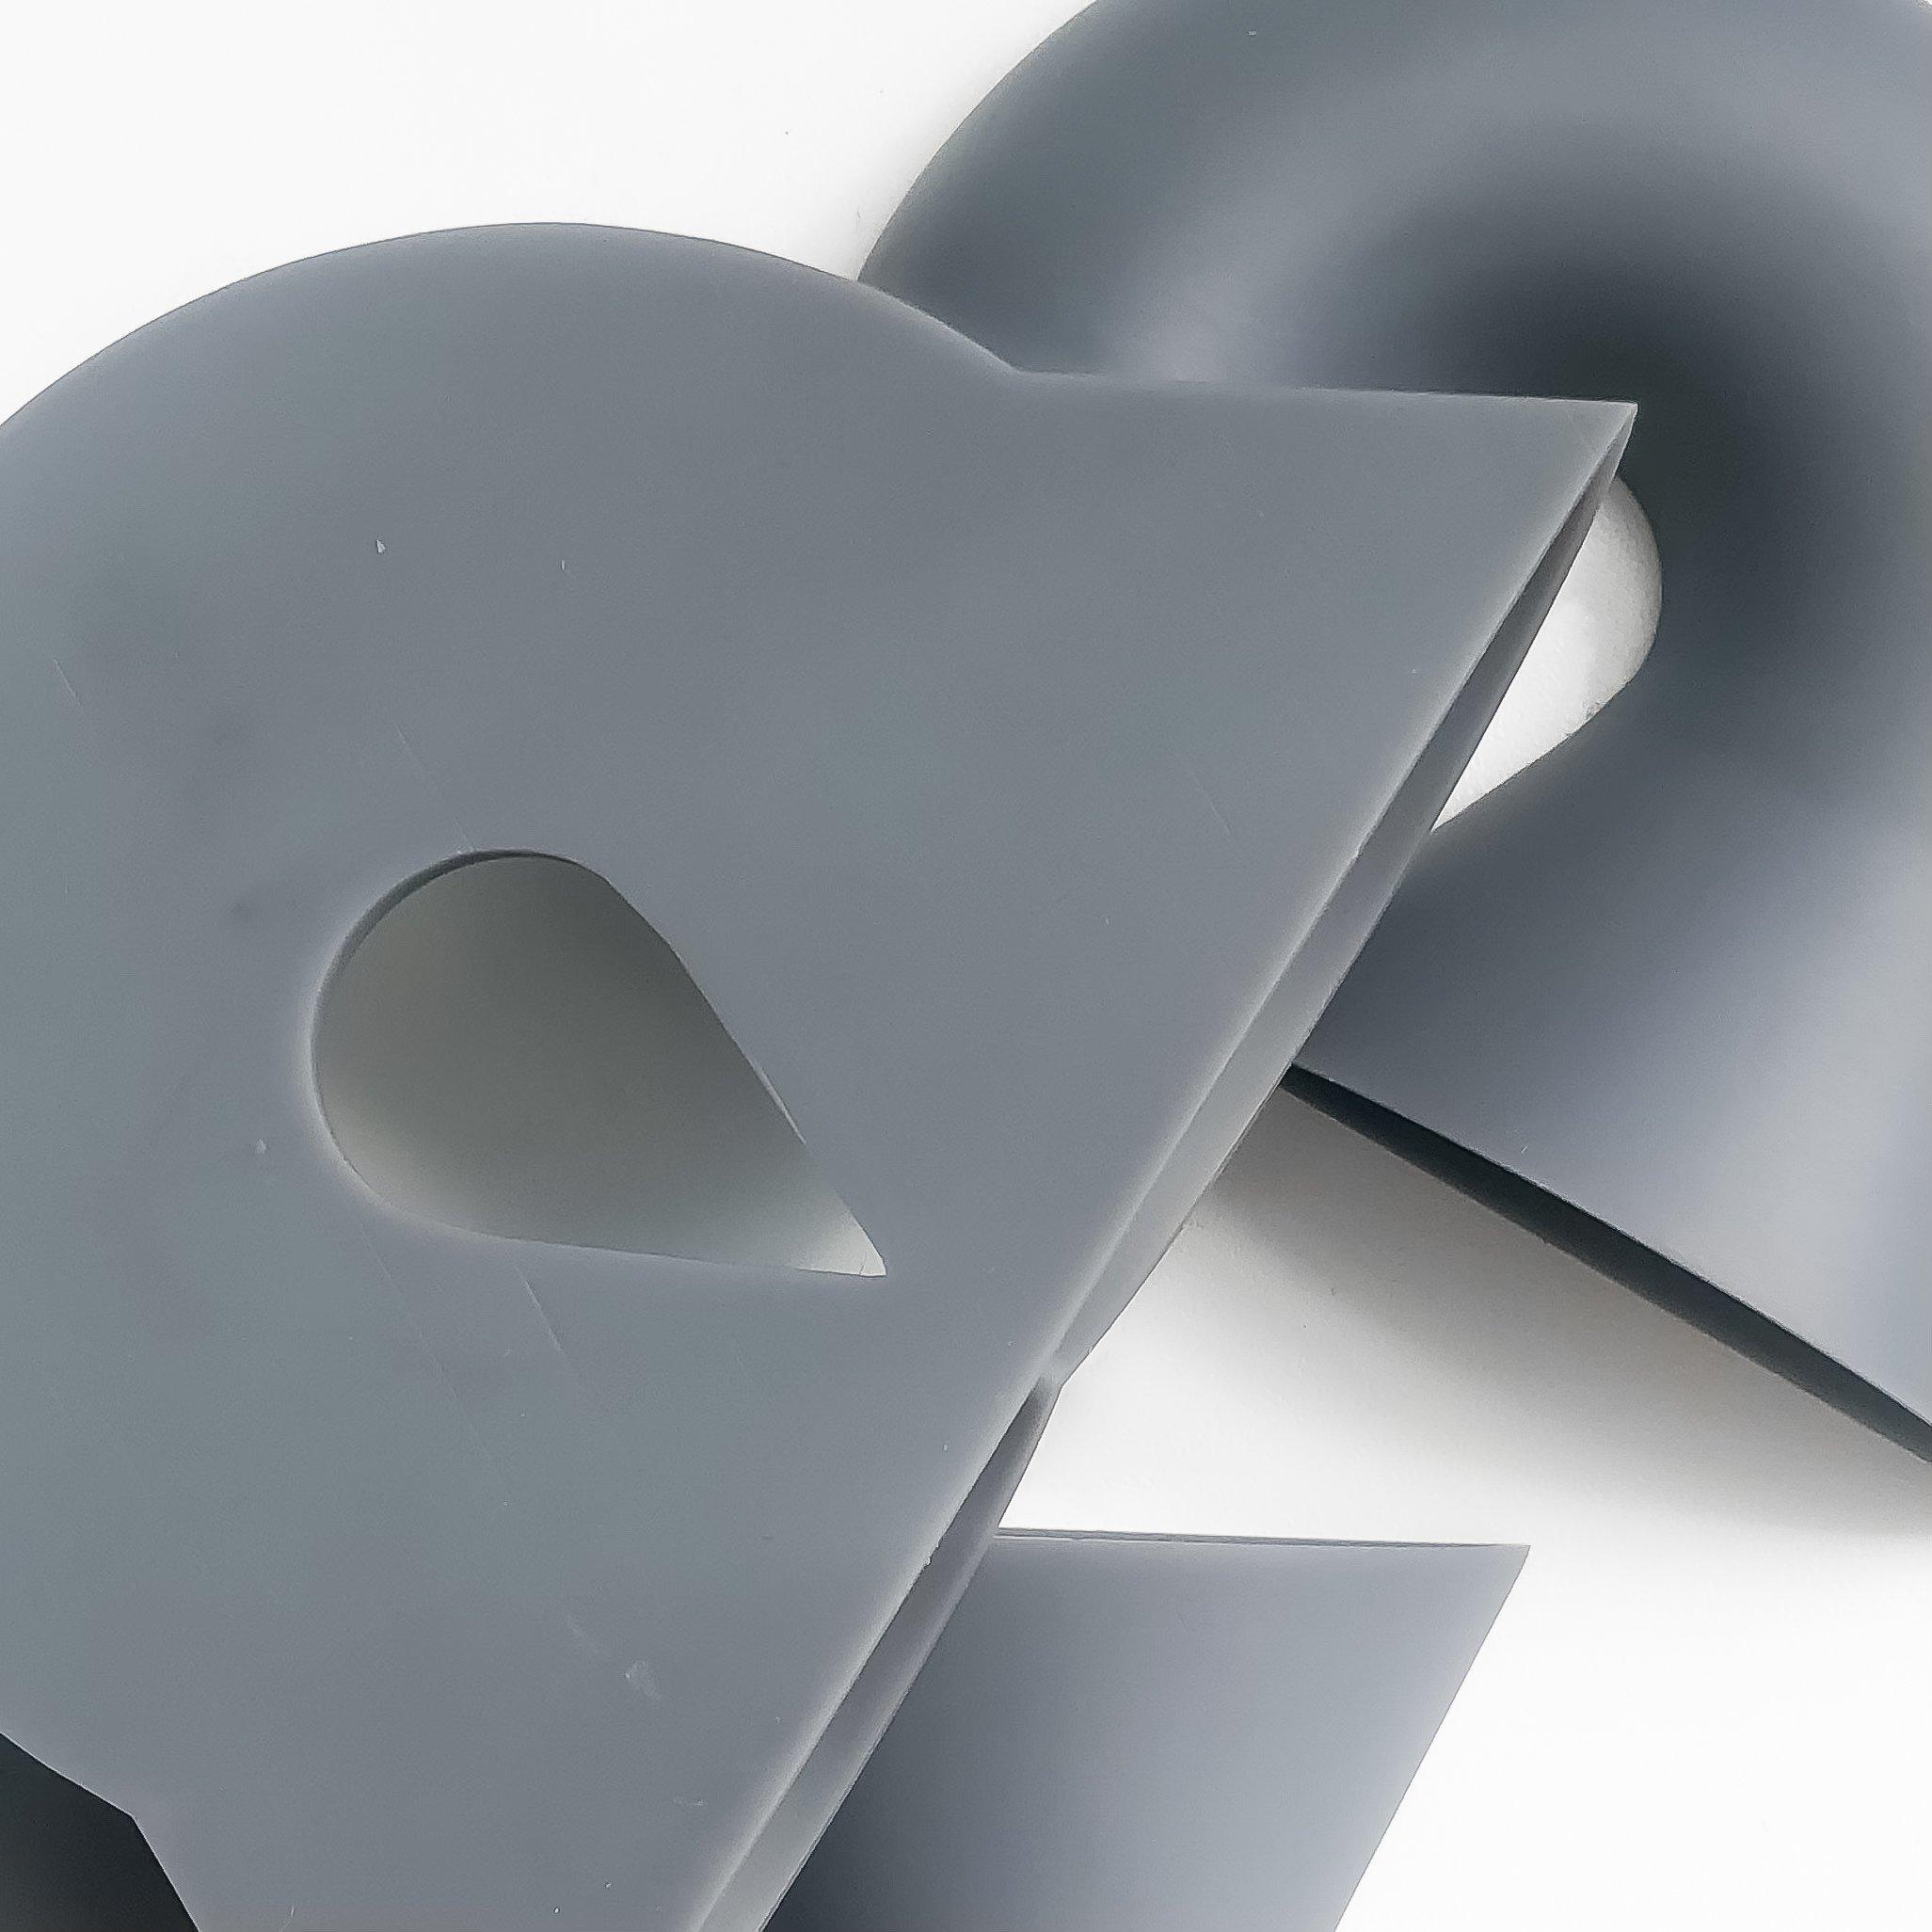 Makelab - 3D Printing Services - Materials - Resins